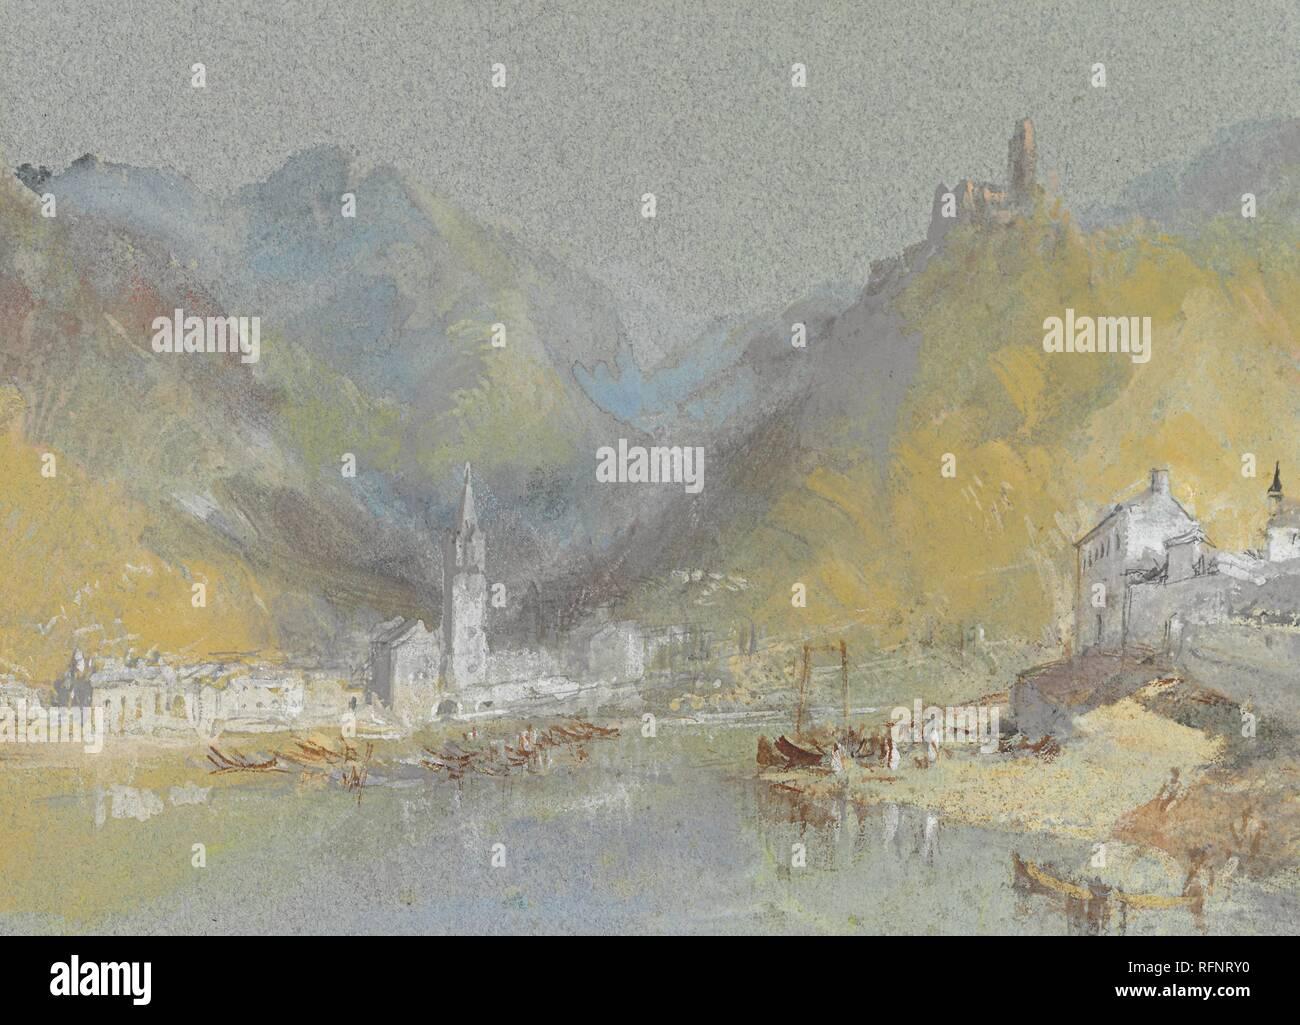 Joseph Mallord William Turner Paintings On The Mosel Bernkastel Kues And The Landshut Germany Jpg Rfnry0 Stock Photo Alamy